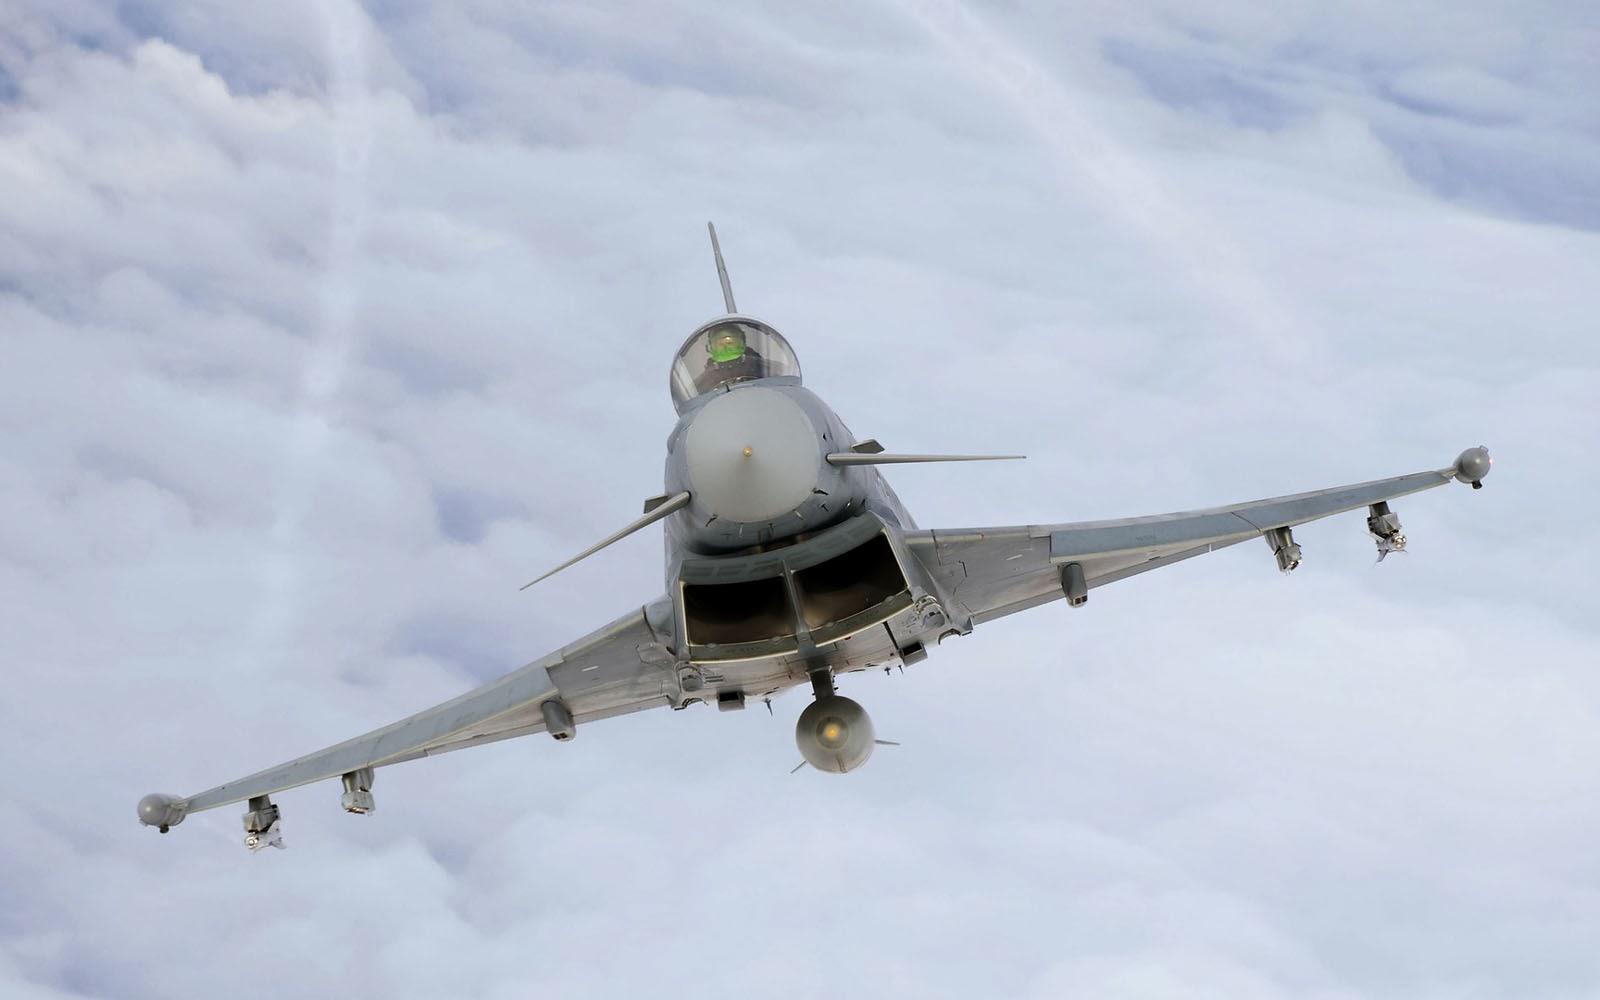 Wallpapers Eurofighter Typhoon Wallpapers